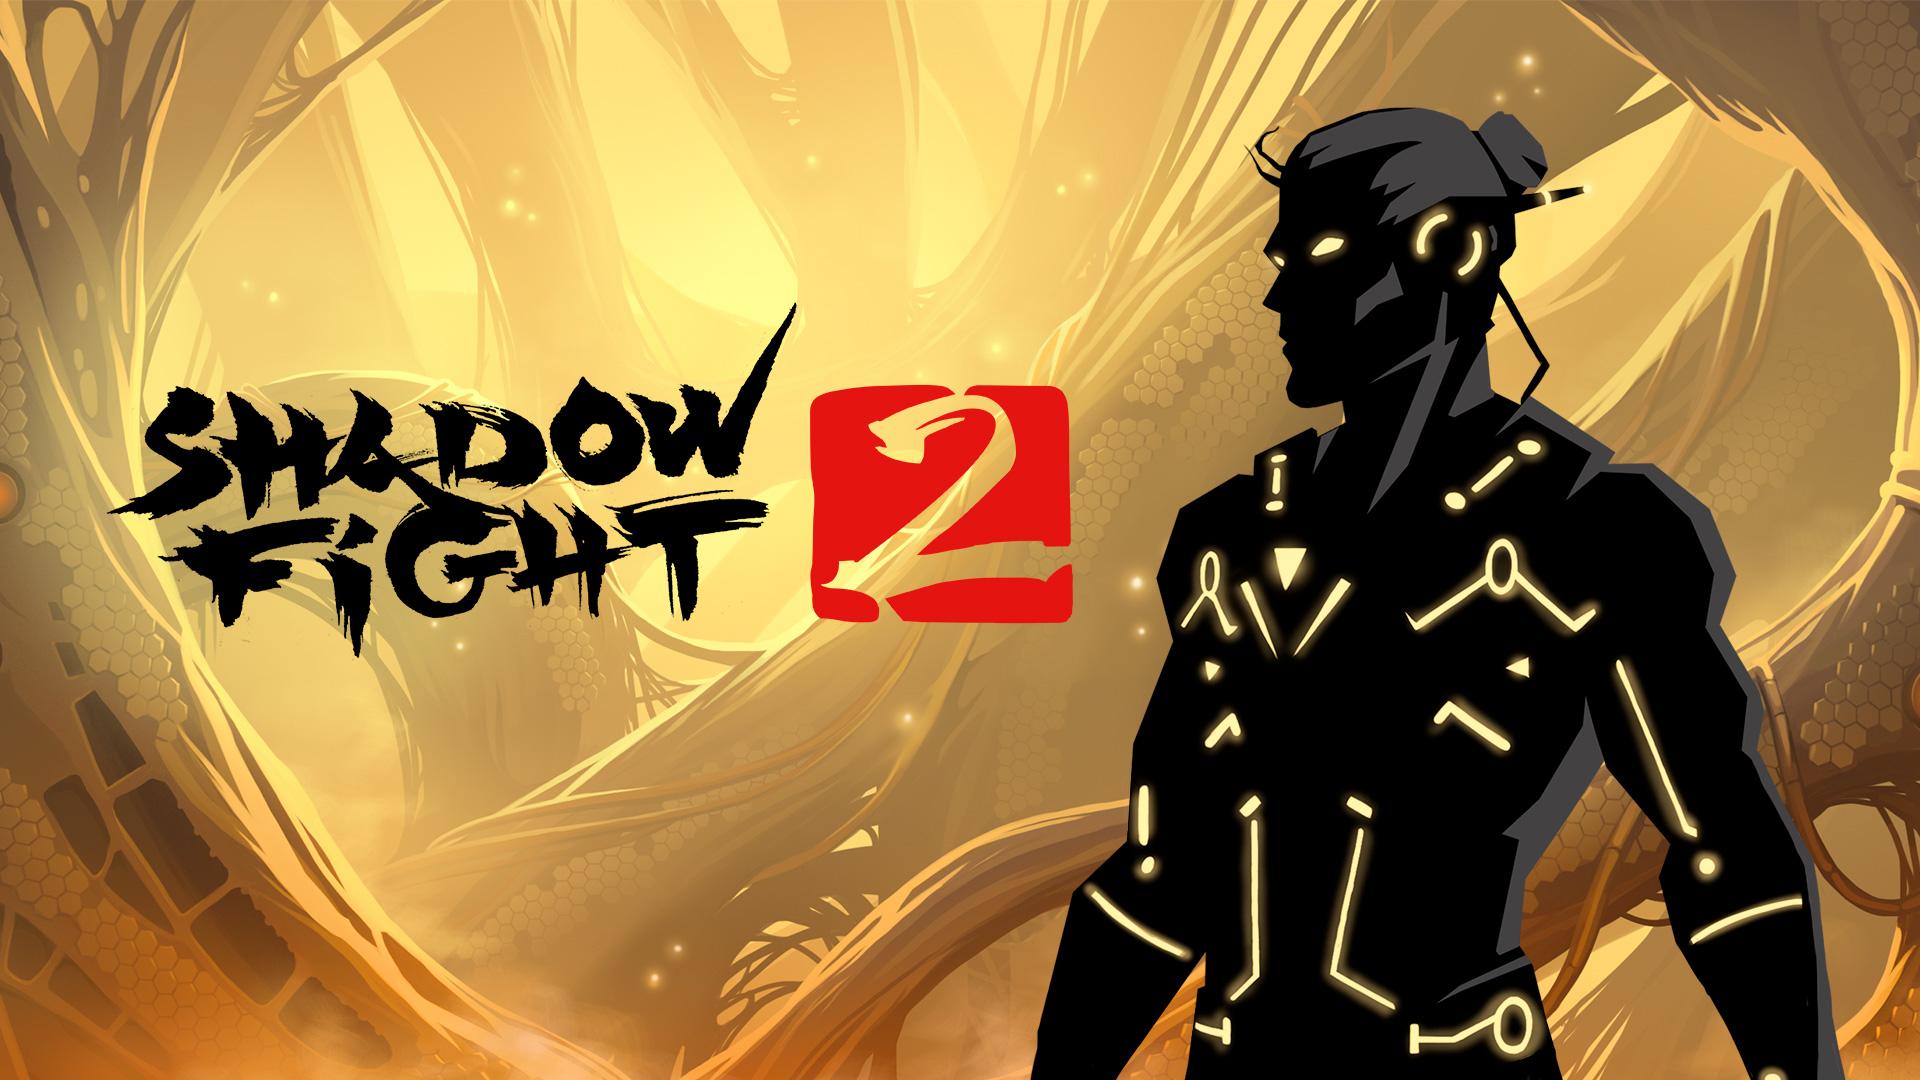 Shadow Fight 2 MOD APK 2.13.0 Download (Full Version/Money)